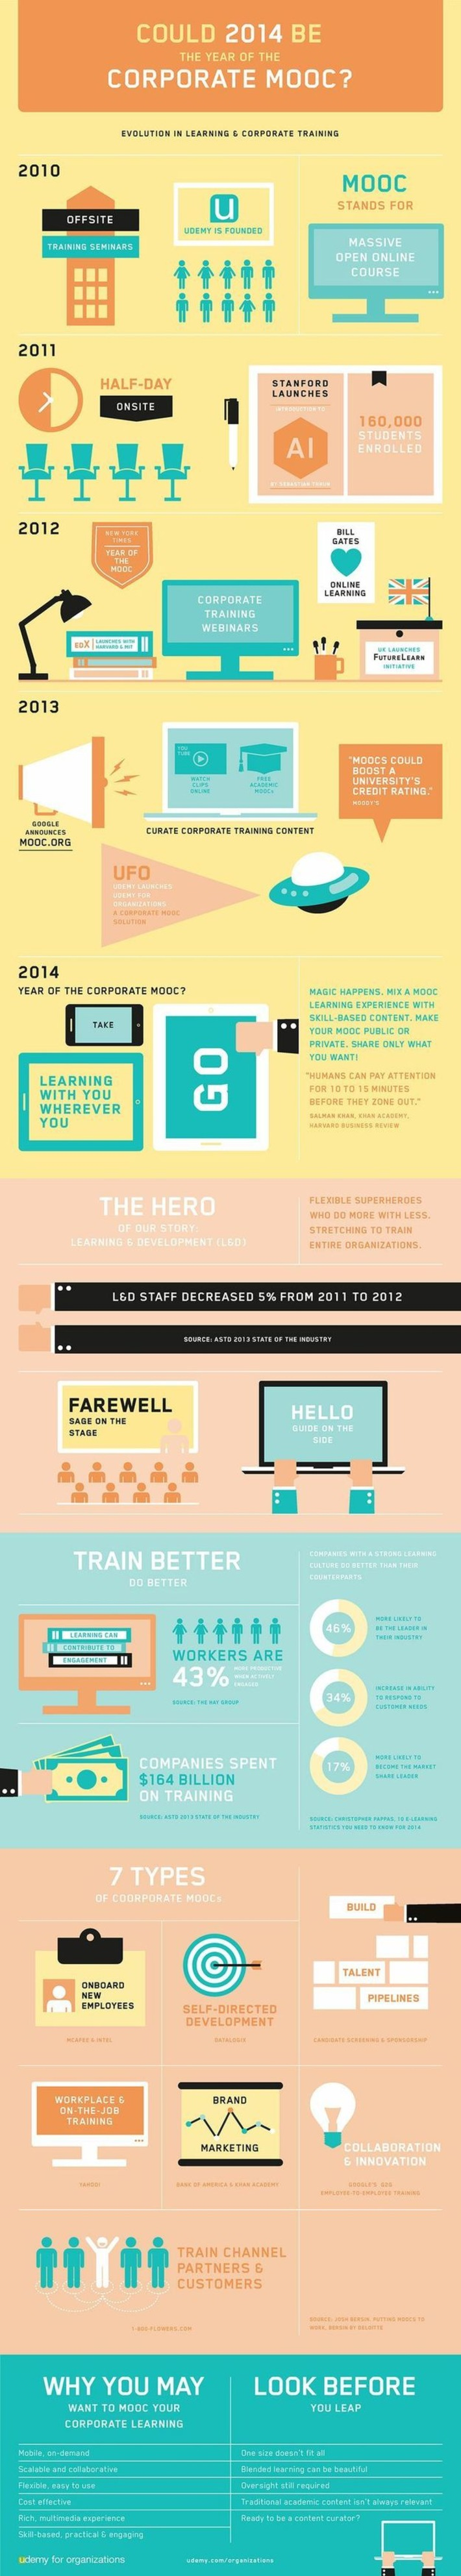 Learning infographic | Social Learning - MOOC - OER | Scoop.it